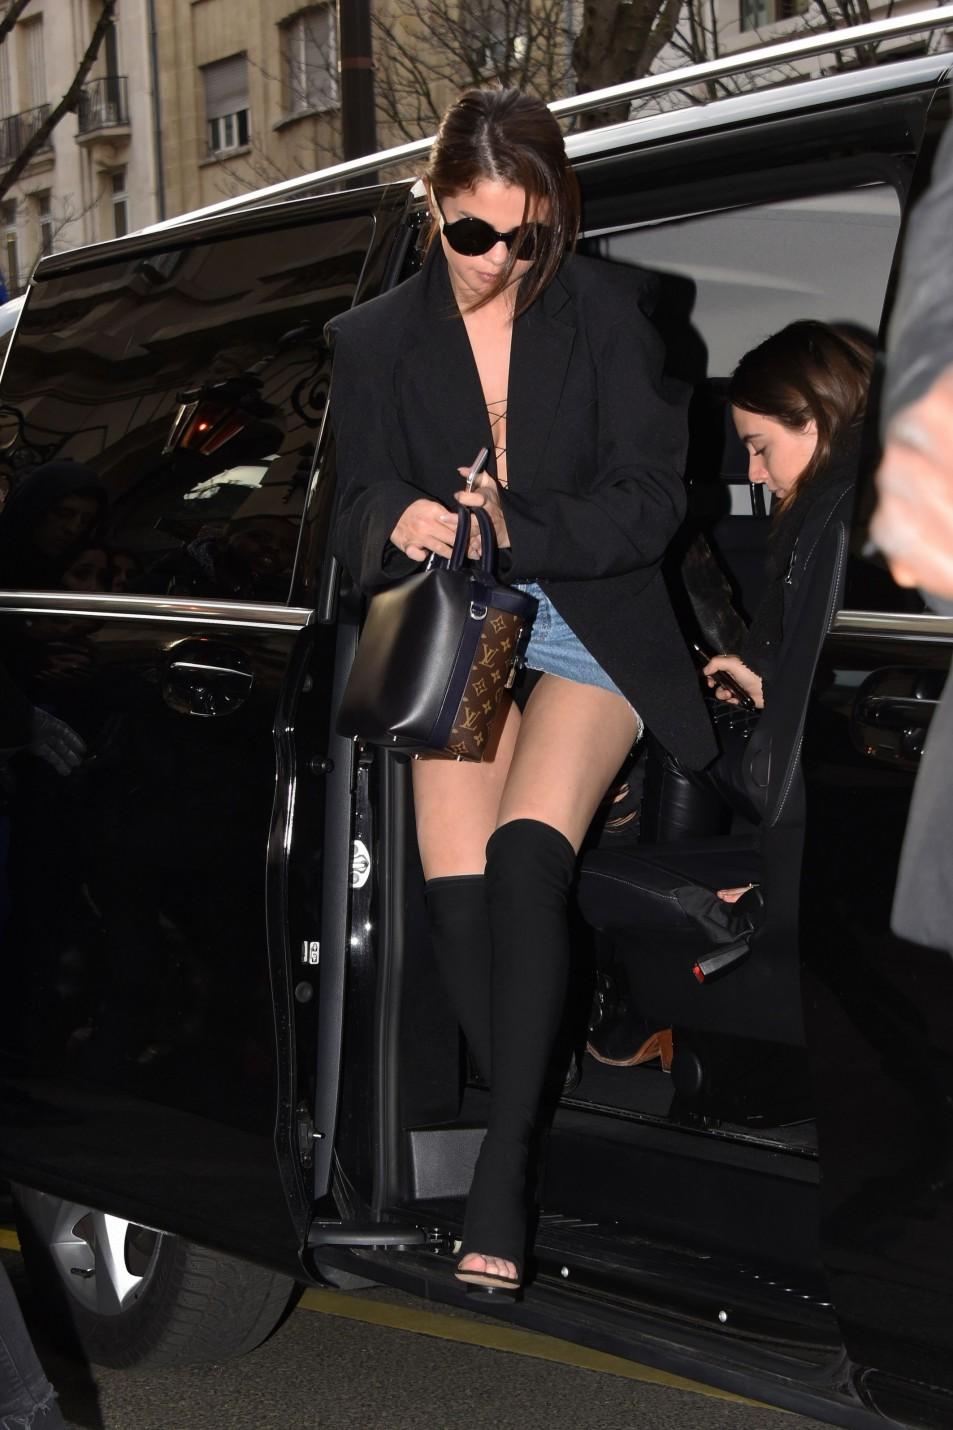 Selena-Gomez-upskirt.jpg